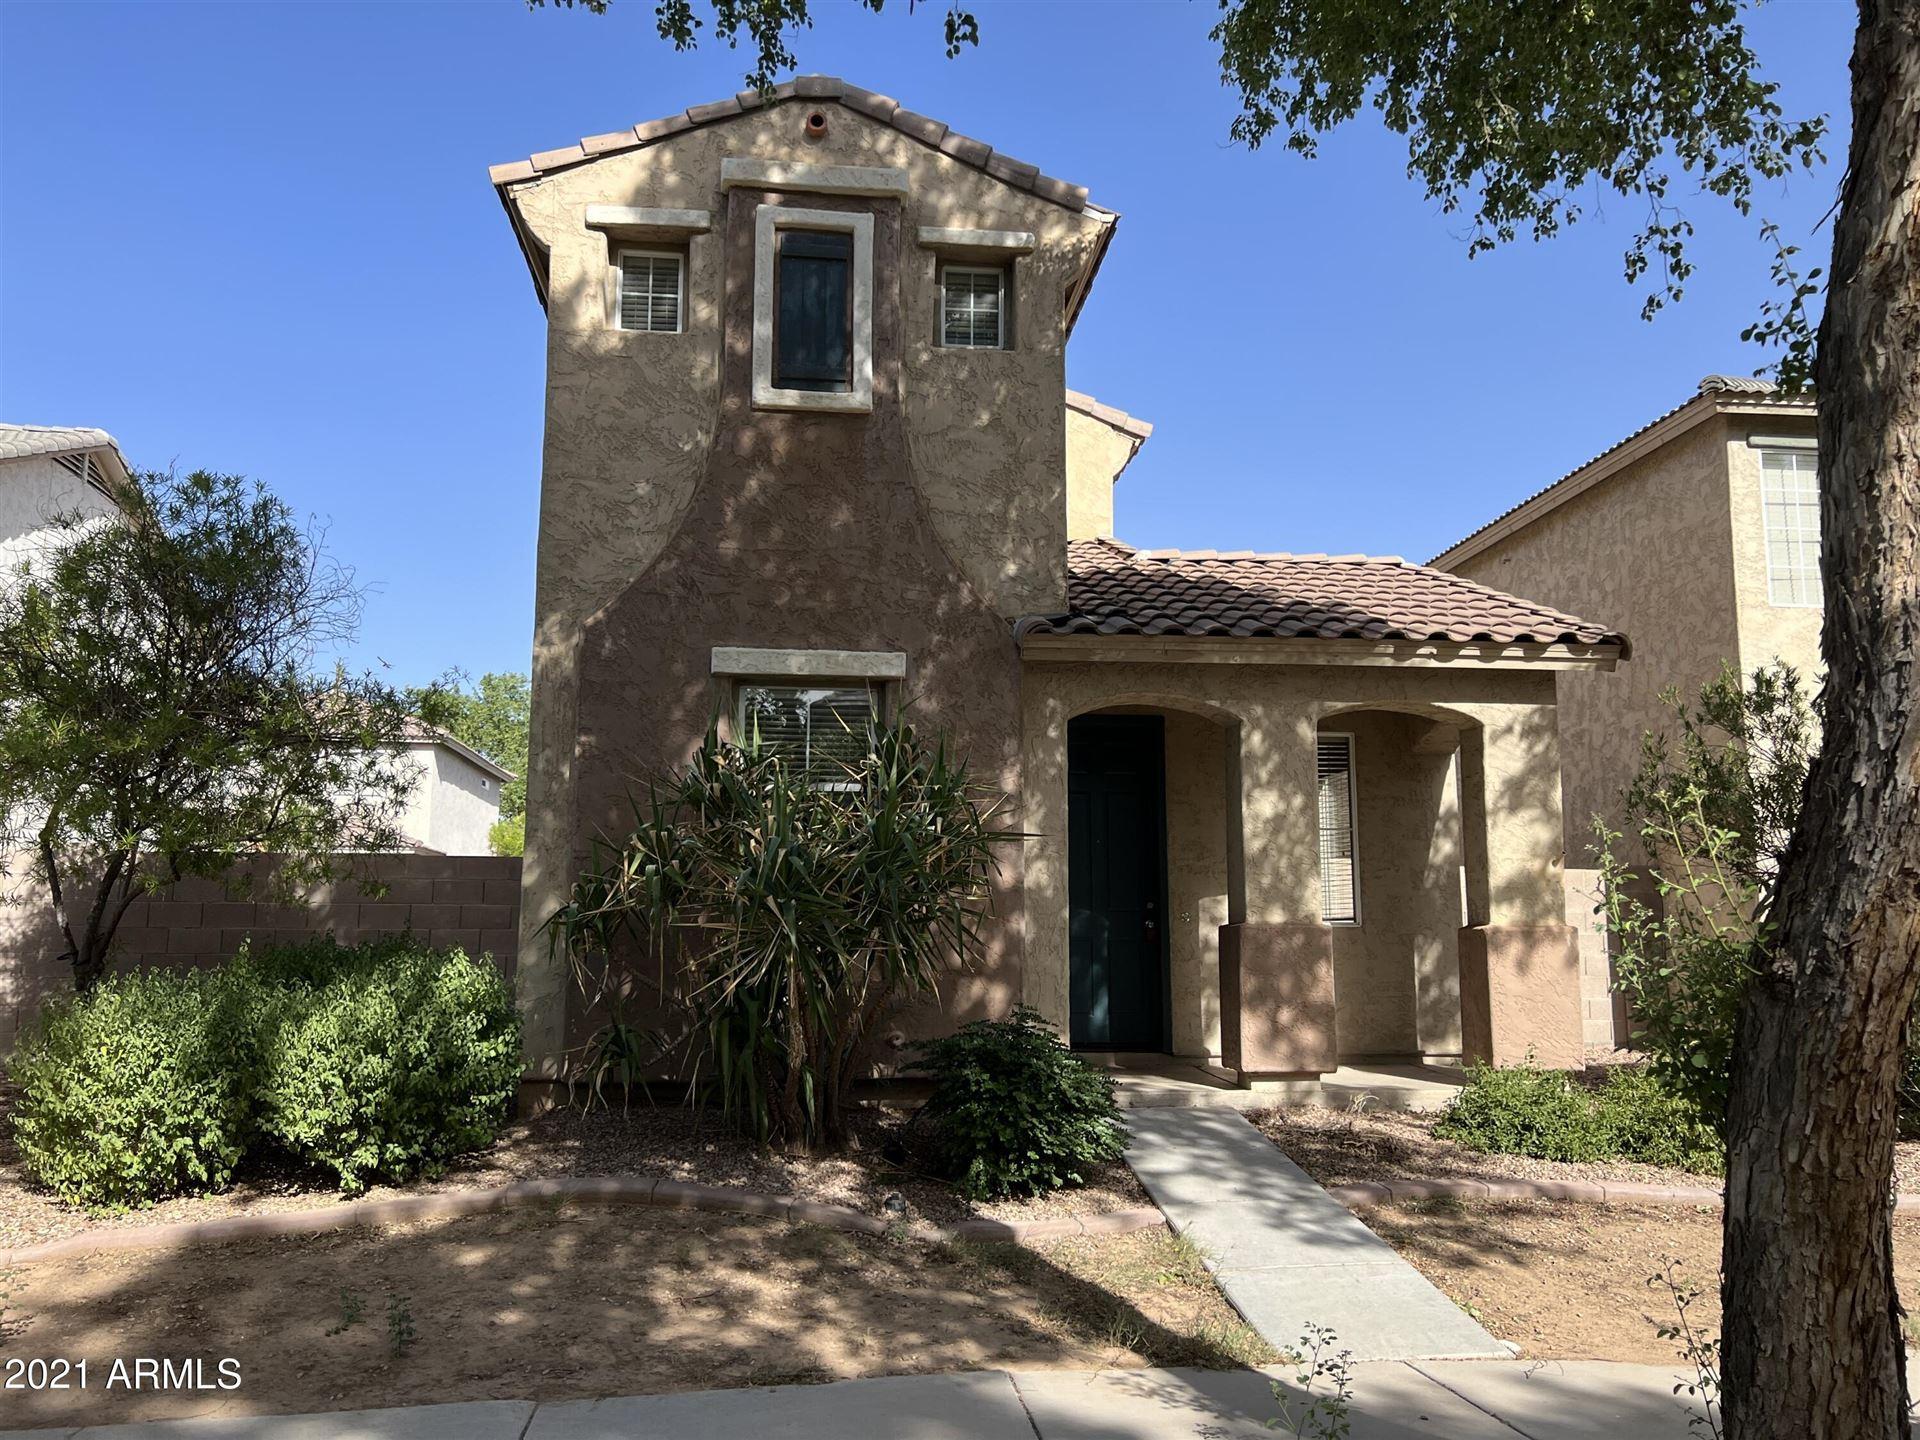 Photo of 10036 W KINGMAN Street, Tolleson, AZ 85353 (MLS # 6306298)